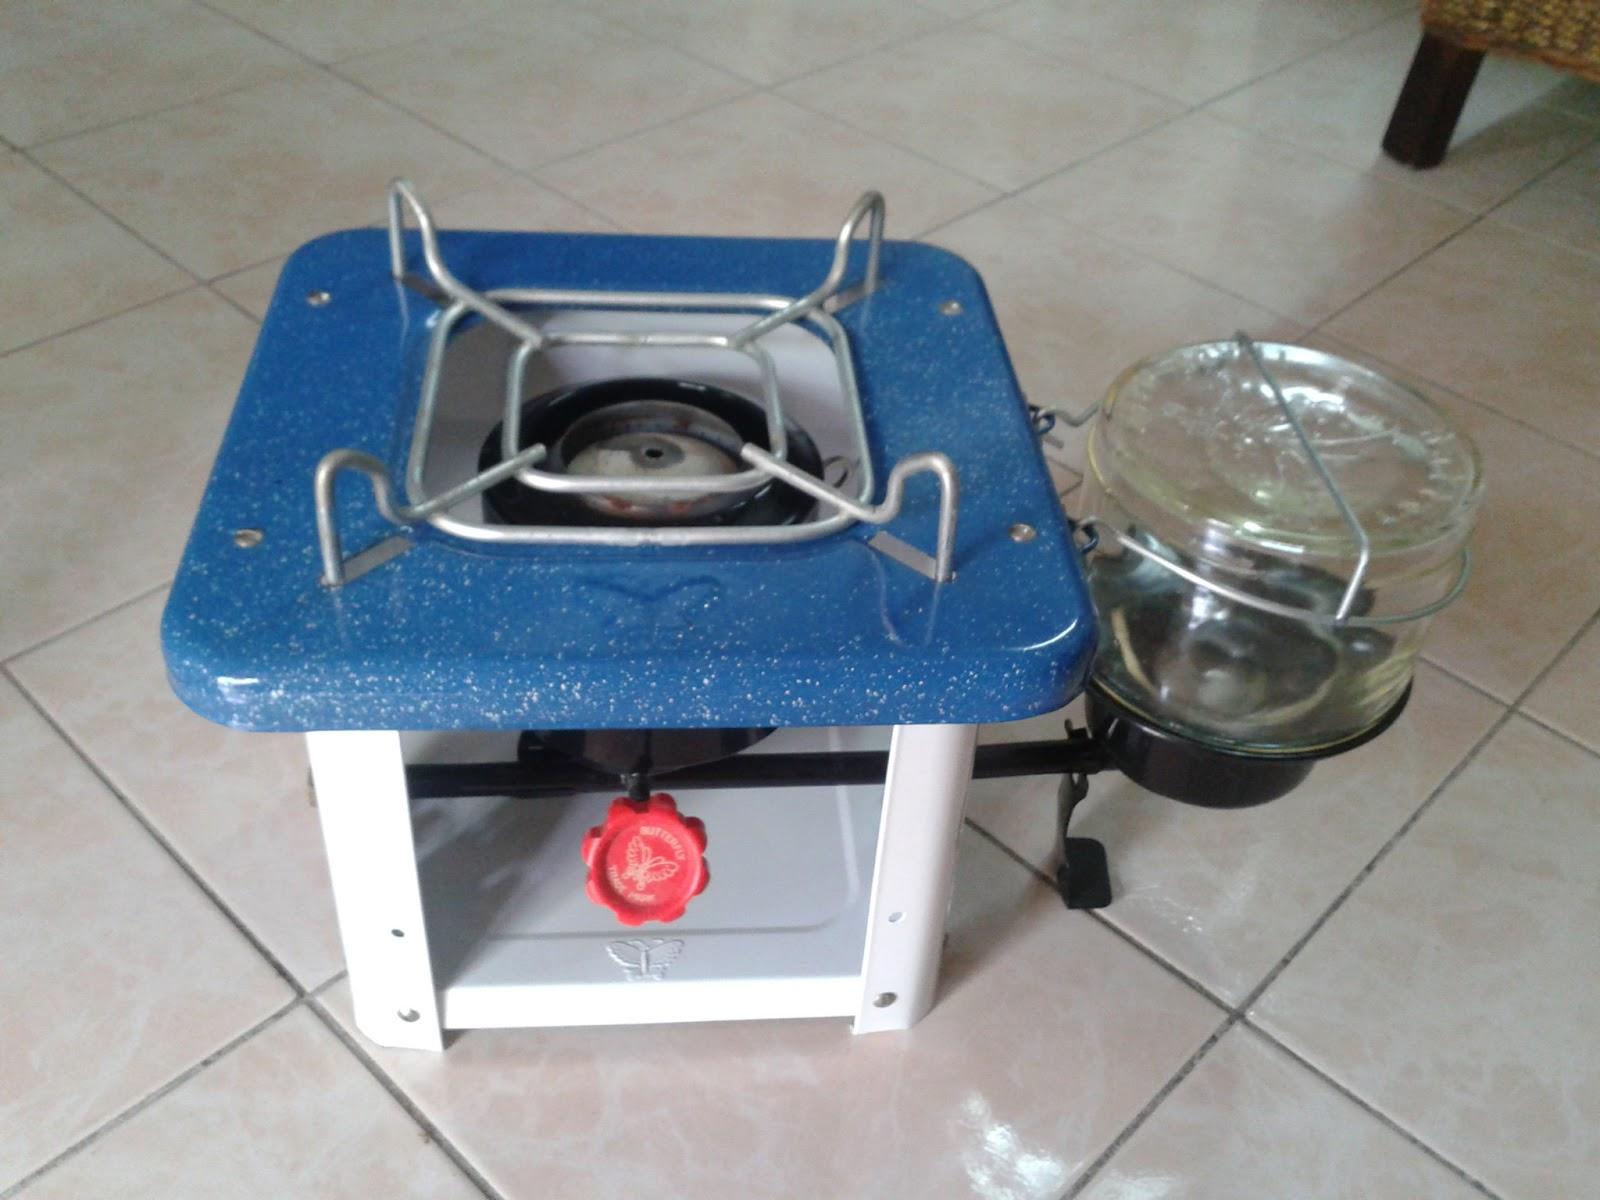 Dapur Minyak Tanah Brand Erfly